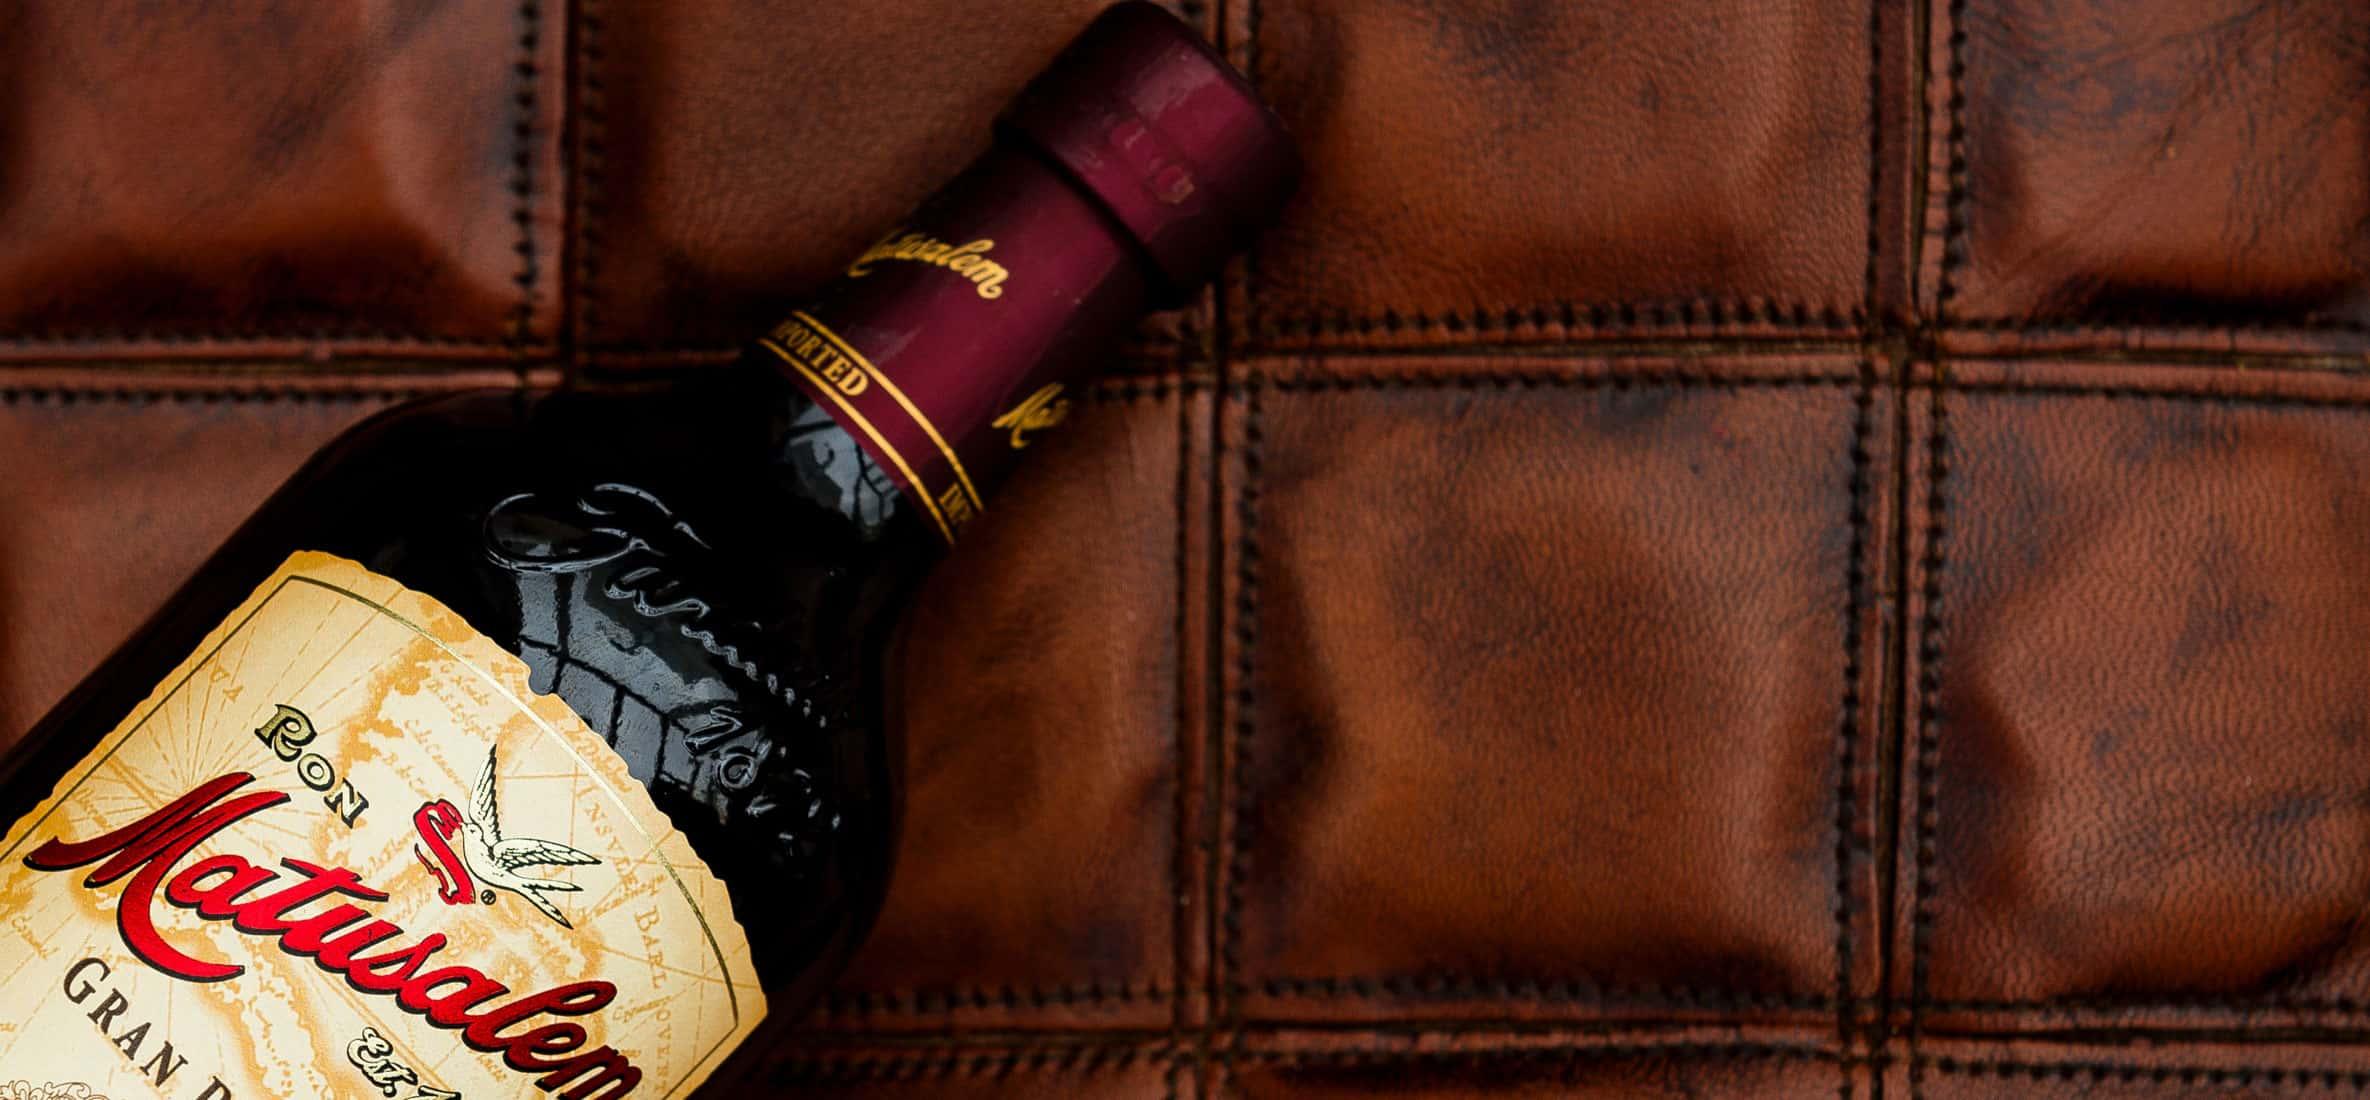 the name of matusalem rum